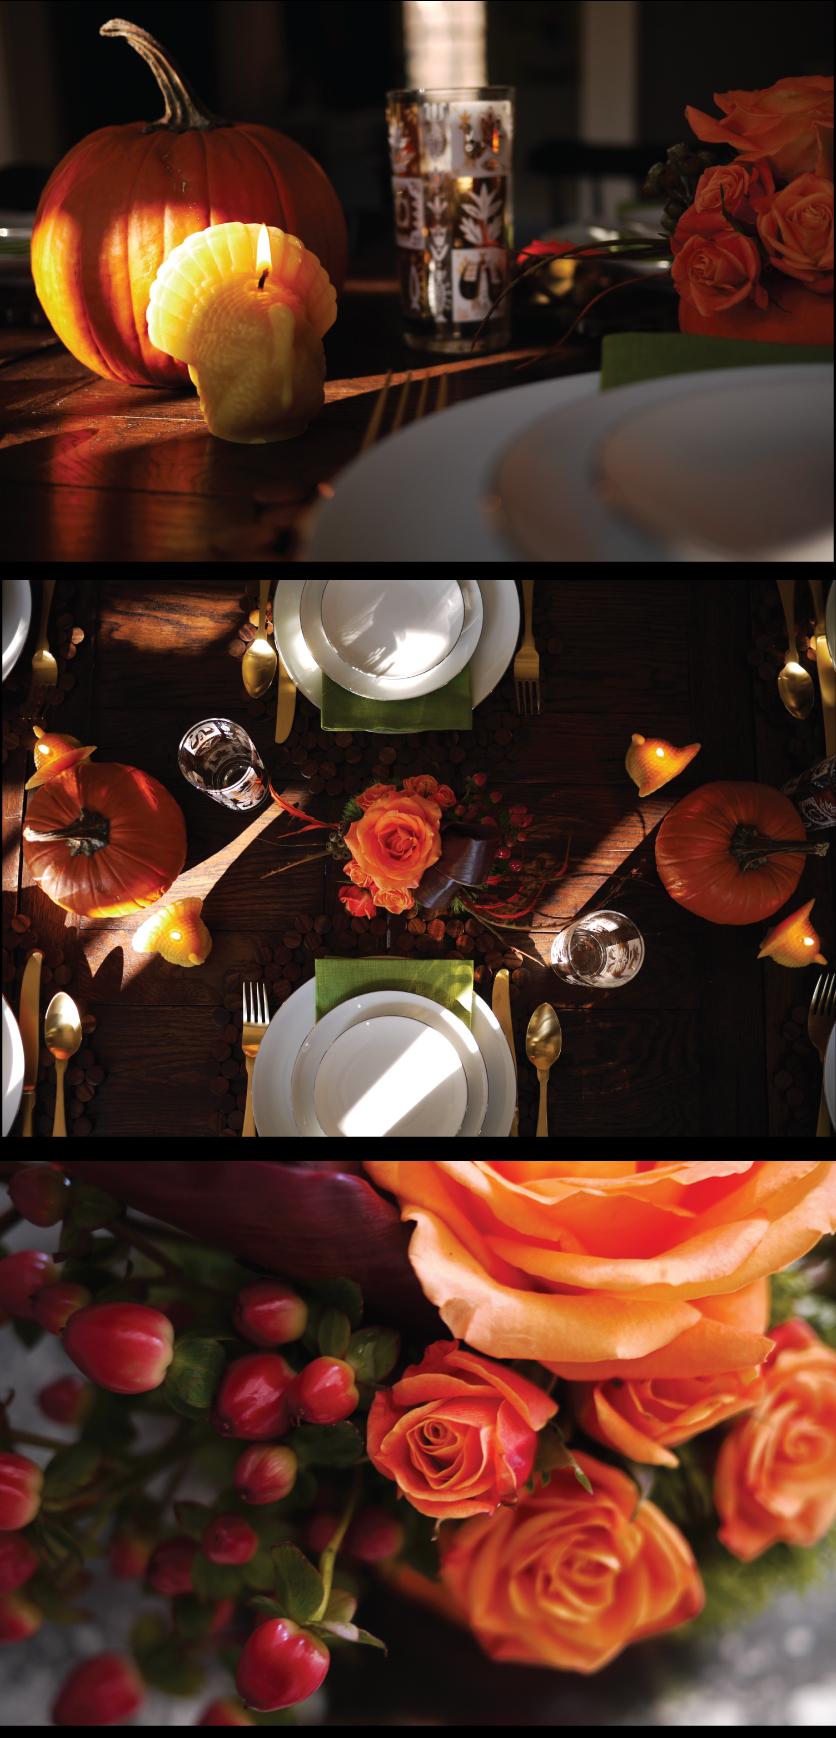 Sferra-Napkins-Vintage-Tumblers-from-Ebay-Urbino-Dinnerware